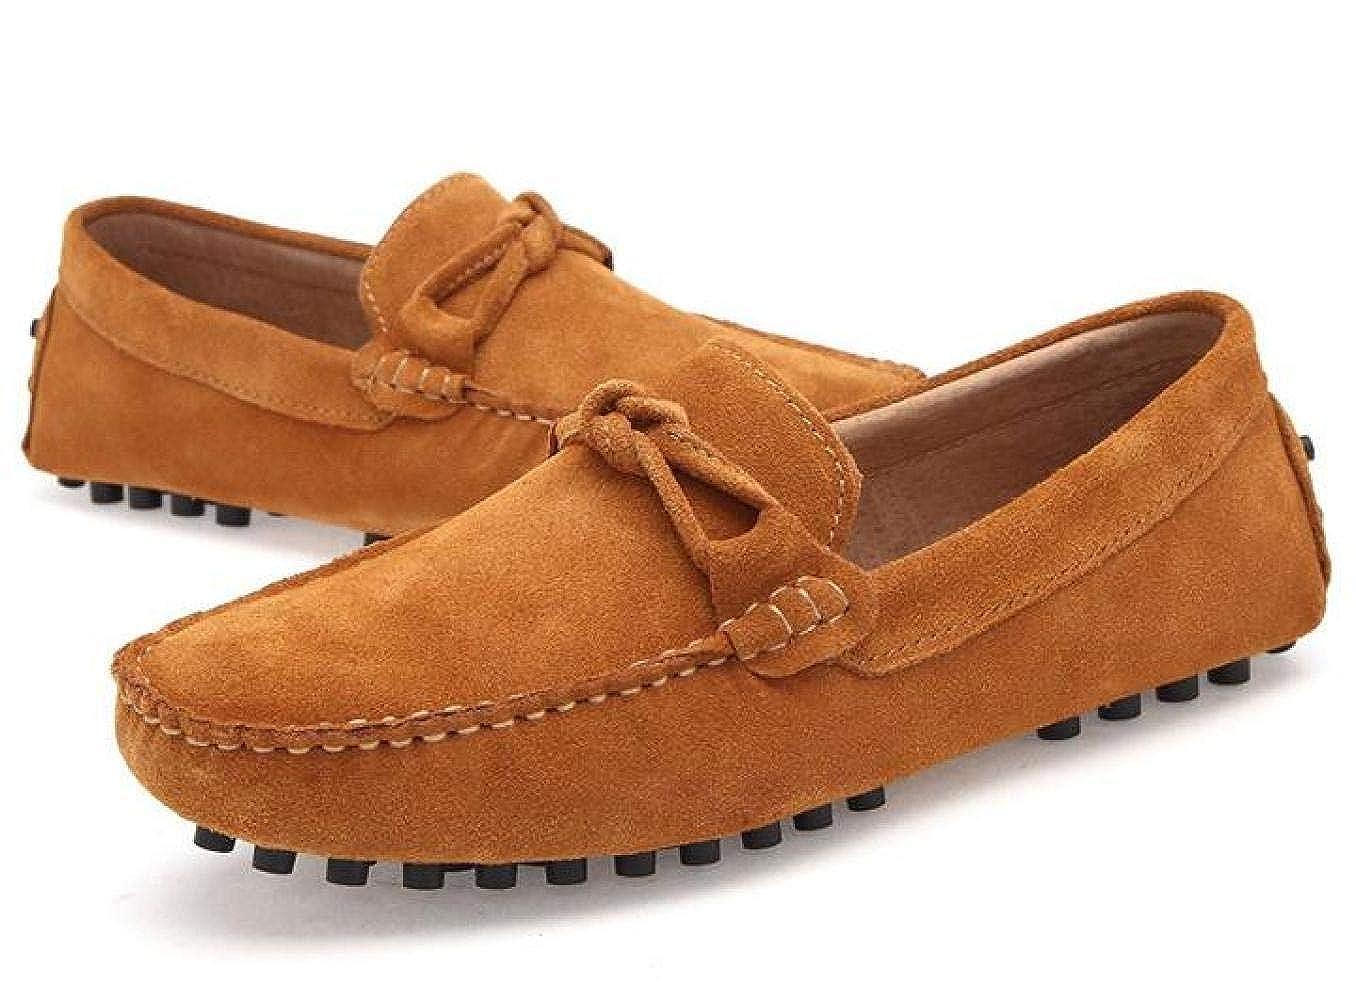 Peas Schuhe Driving Leder Herren Freizeitschuhe England Schuhe Mode Lazy Driving Schuhe Schuhe Herrenschuhe Braun 67f8e6